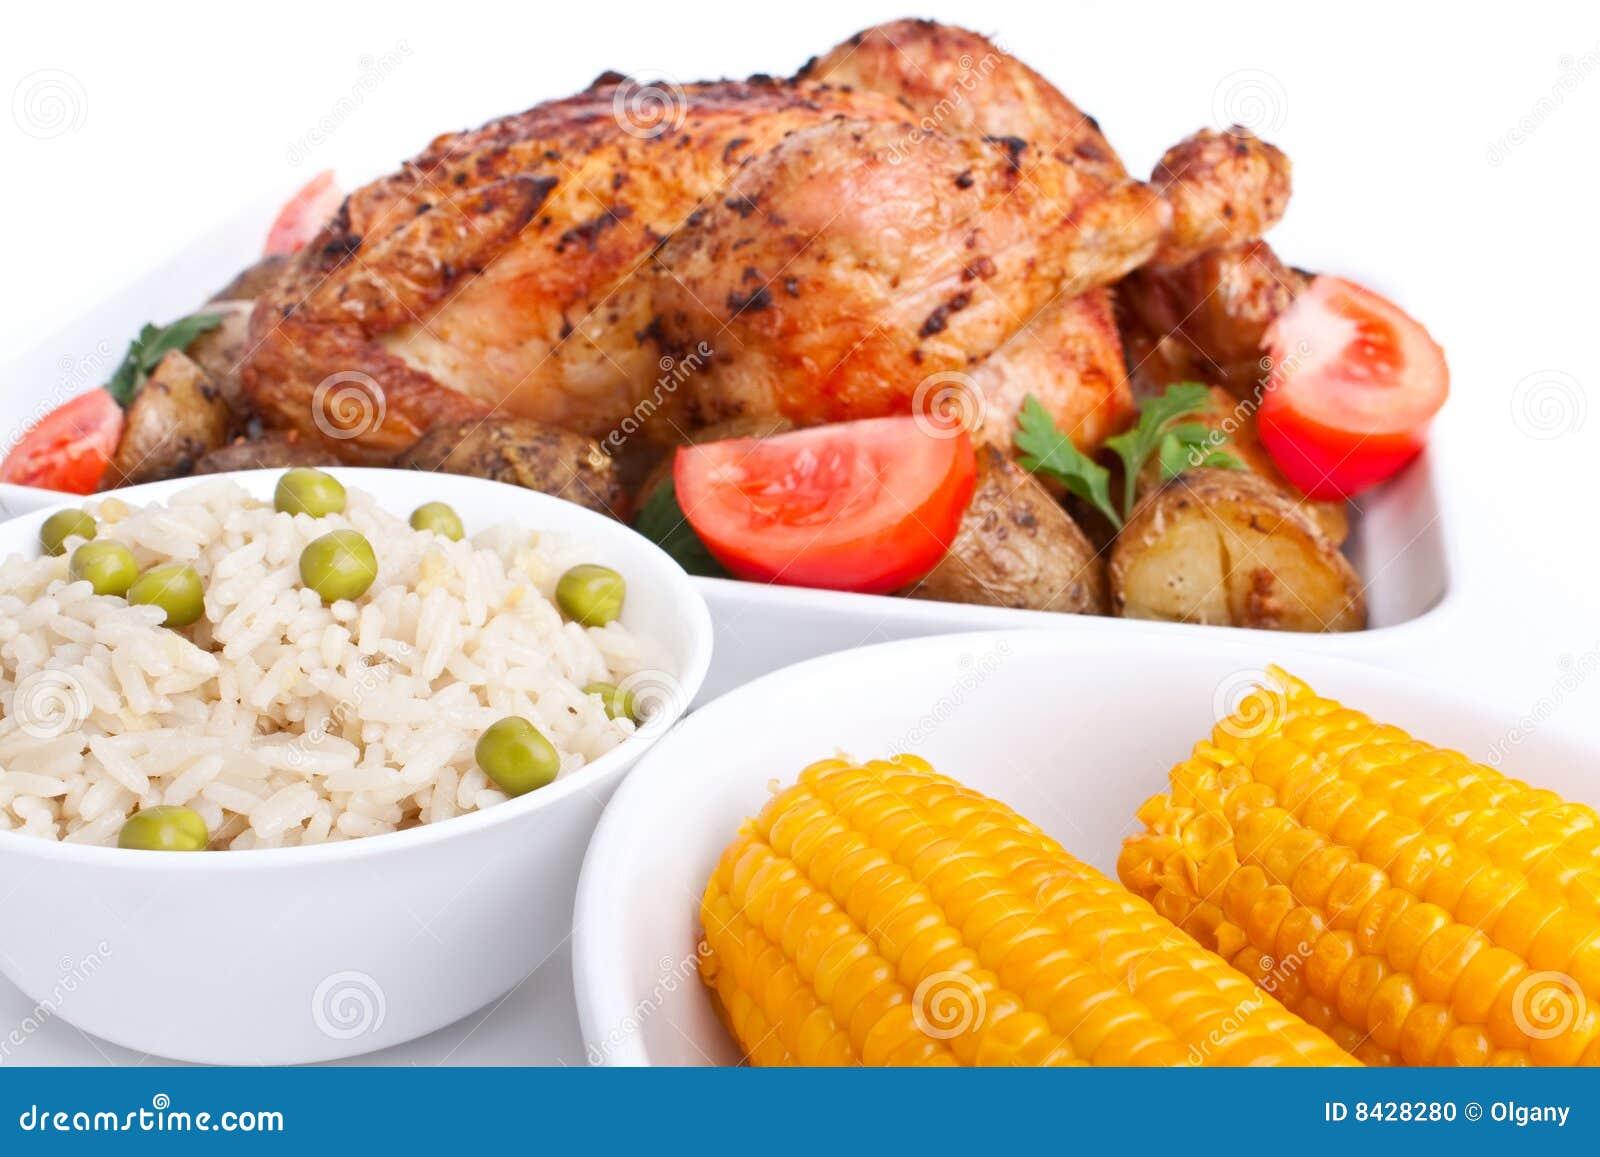 Roasted chicken, potatoes,rice, corn